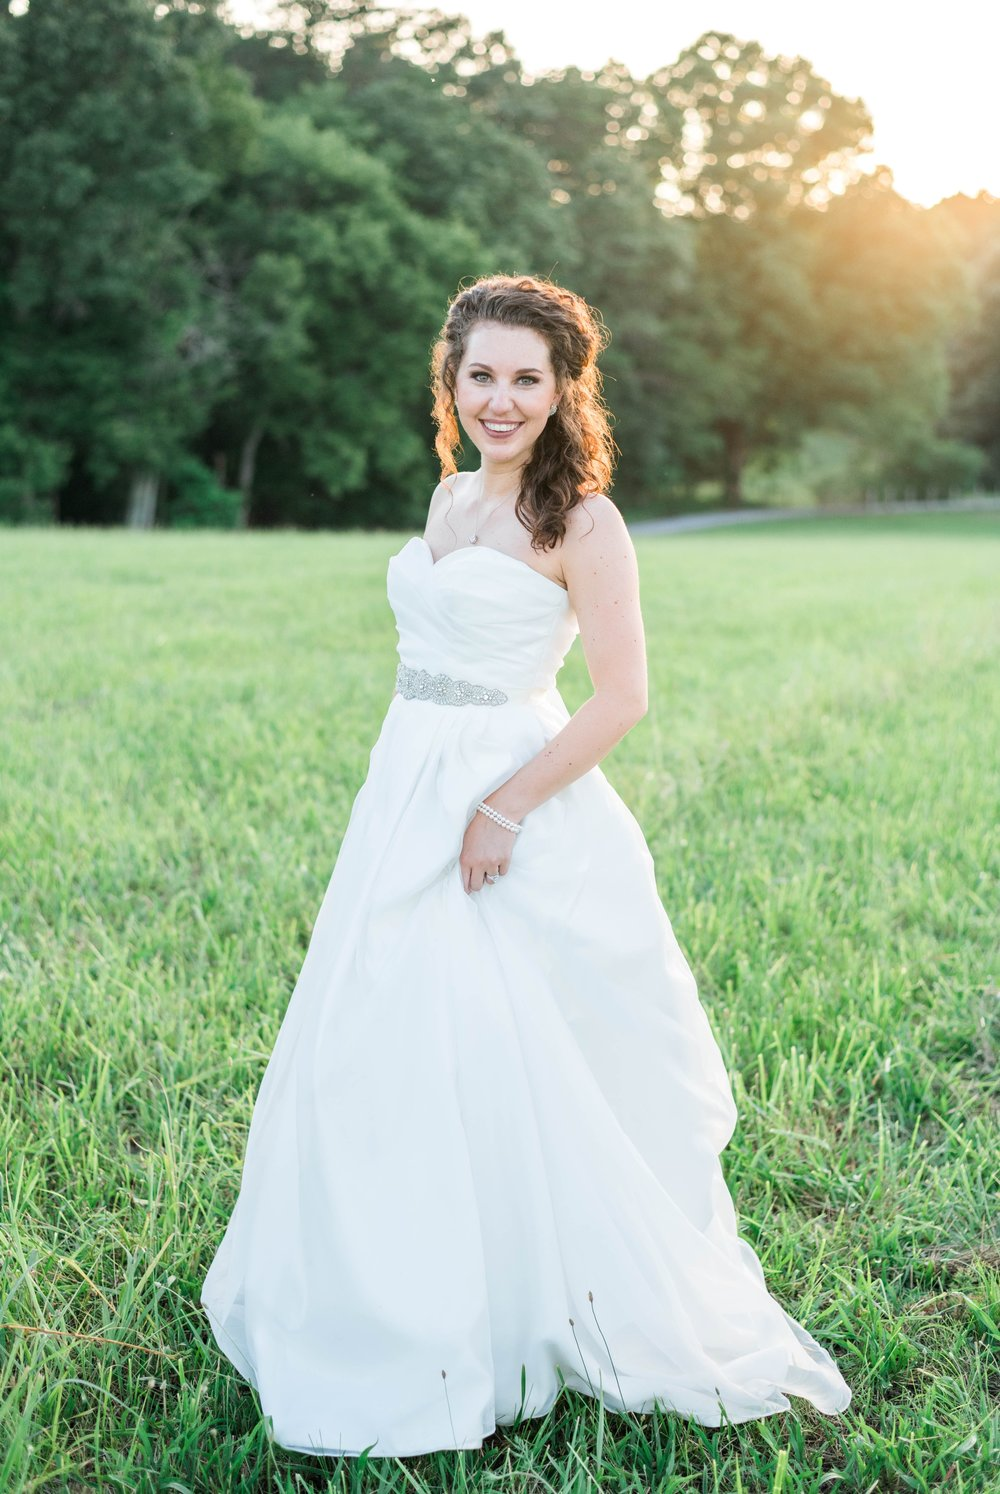 SorellaFarms_EvingtonVA_Lynchburgweddingphotographer_VirginiaweddingPhotographer_AshleyAndrewSorellaFarmsWedding 26.jpg